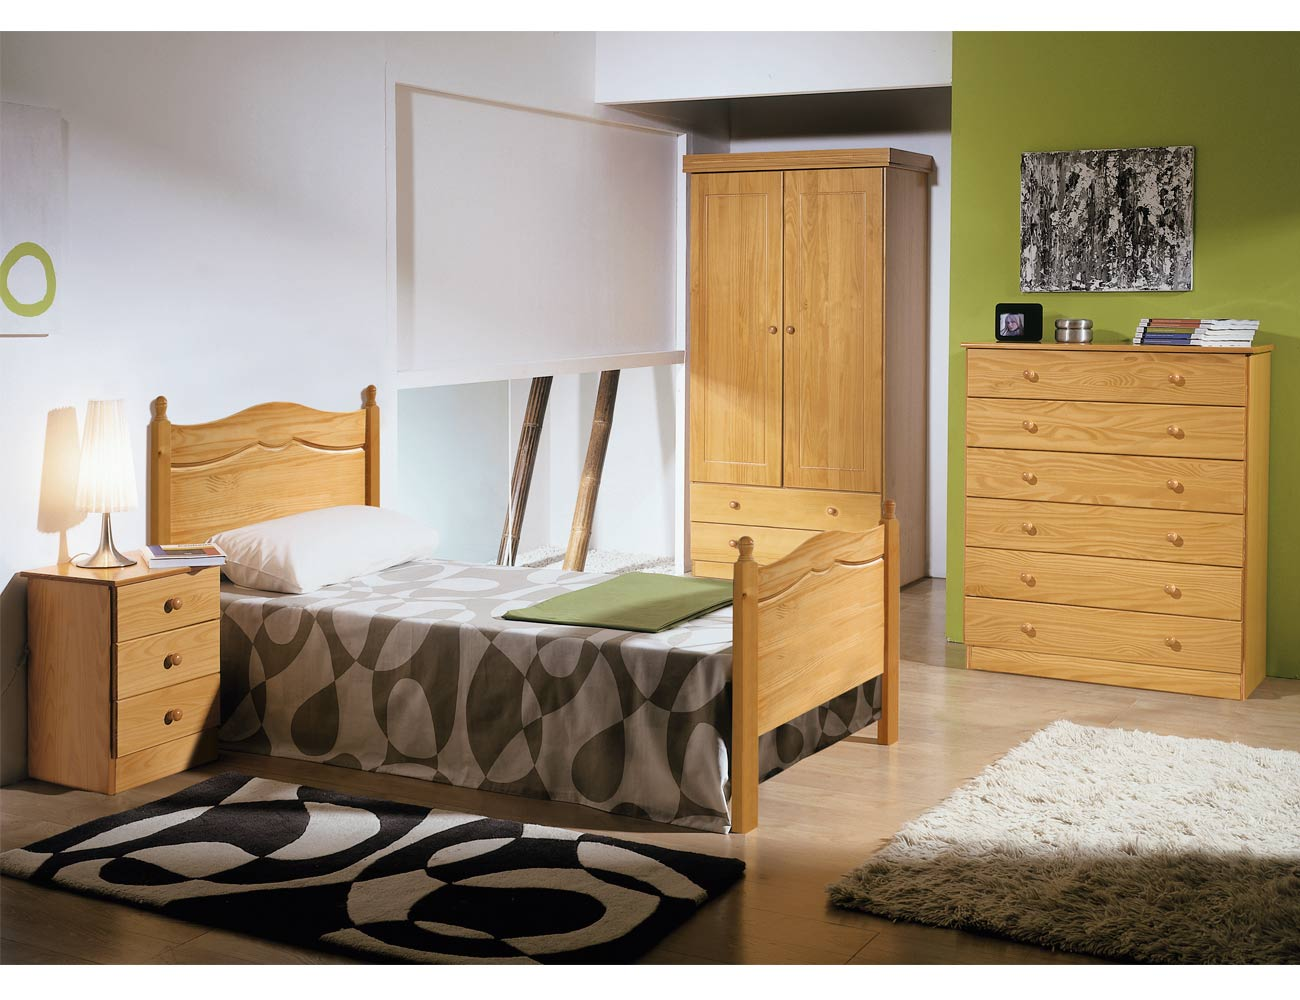 Dormitorio juvenil malaga madera pino provenzal4